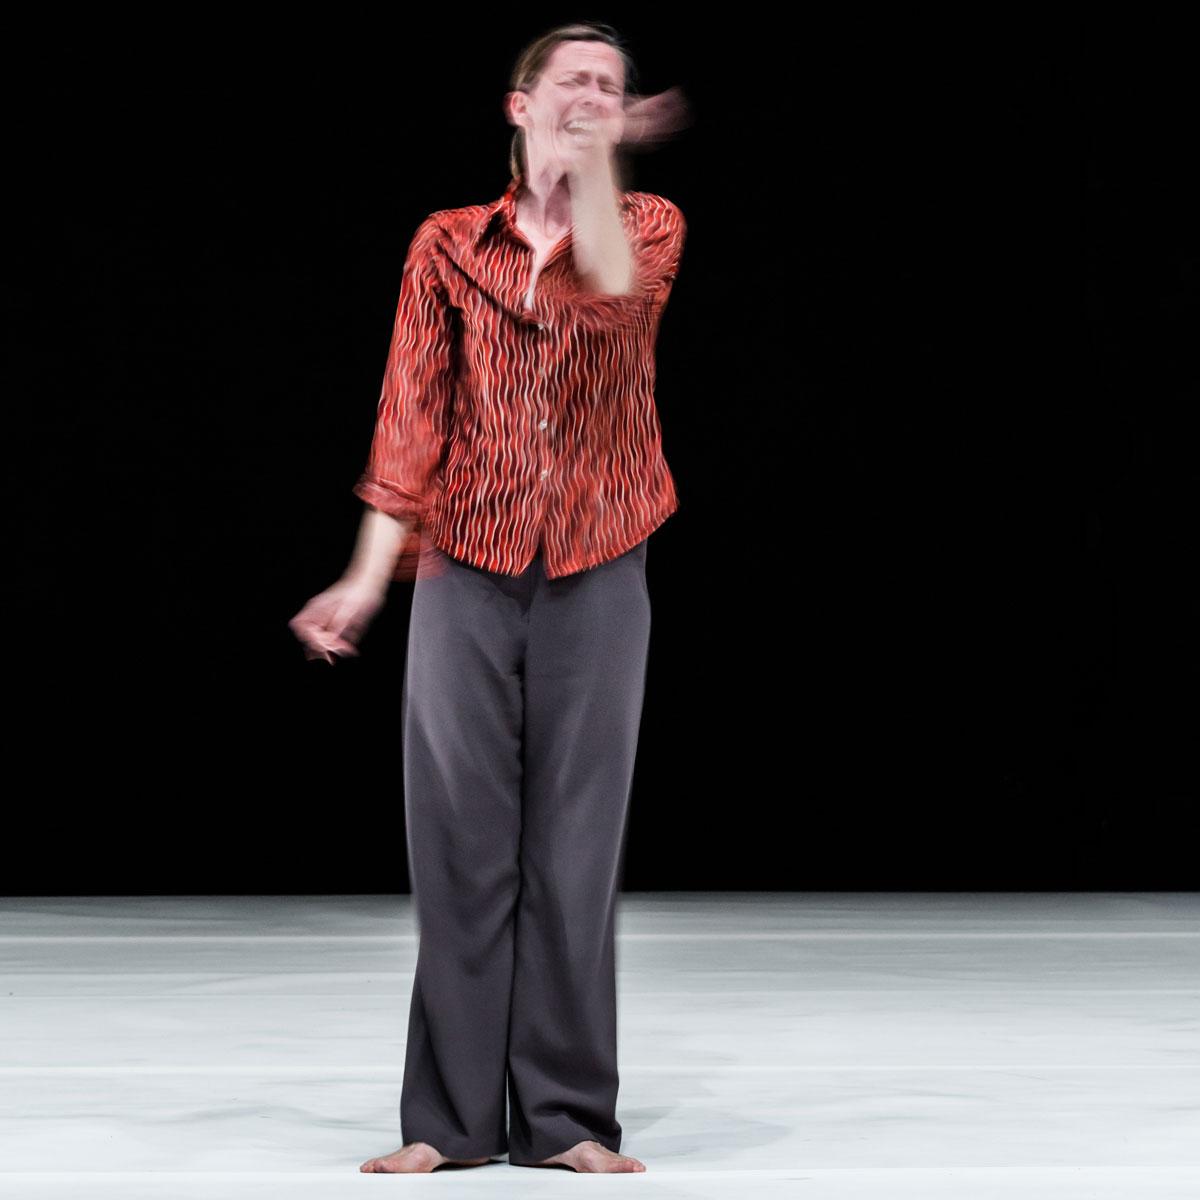 photo danse femme danseuse cie blicke strasbourg